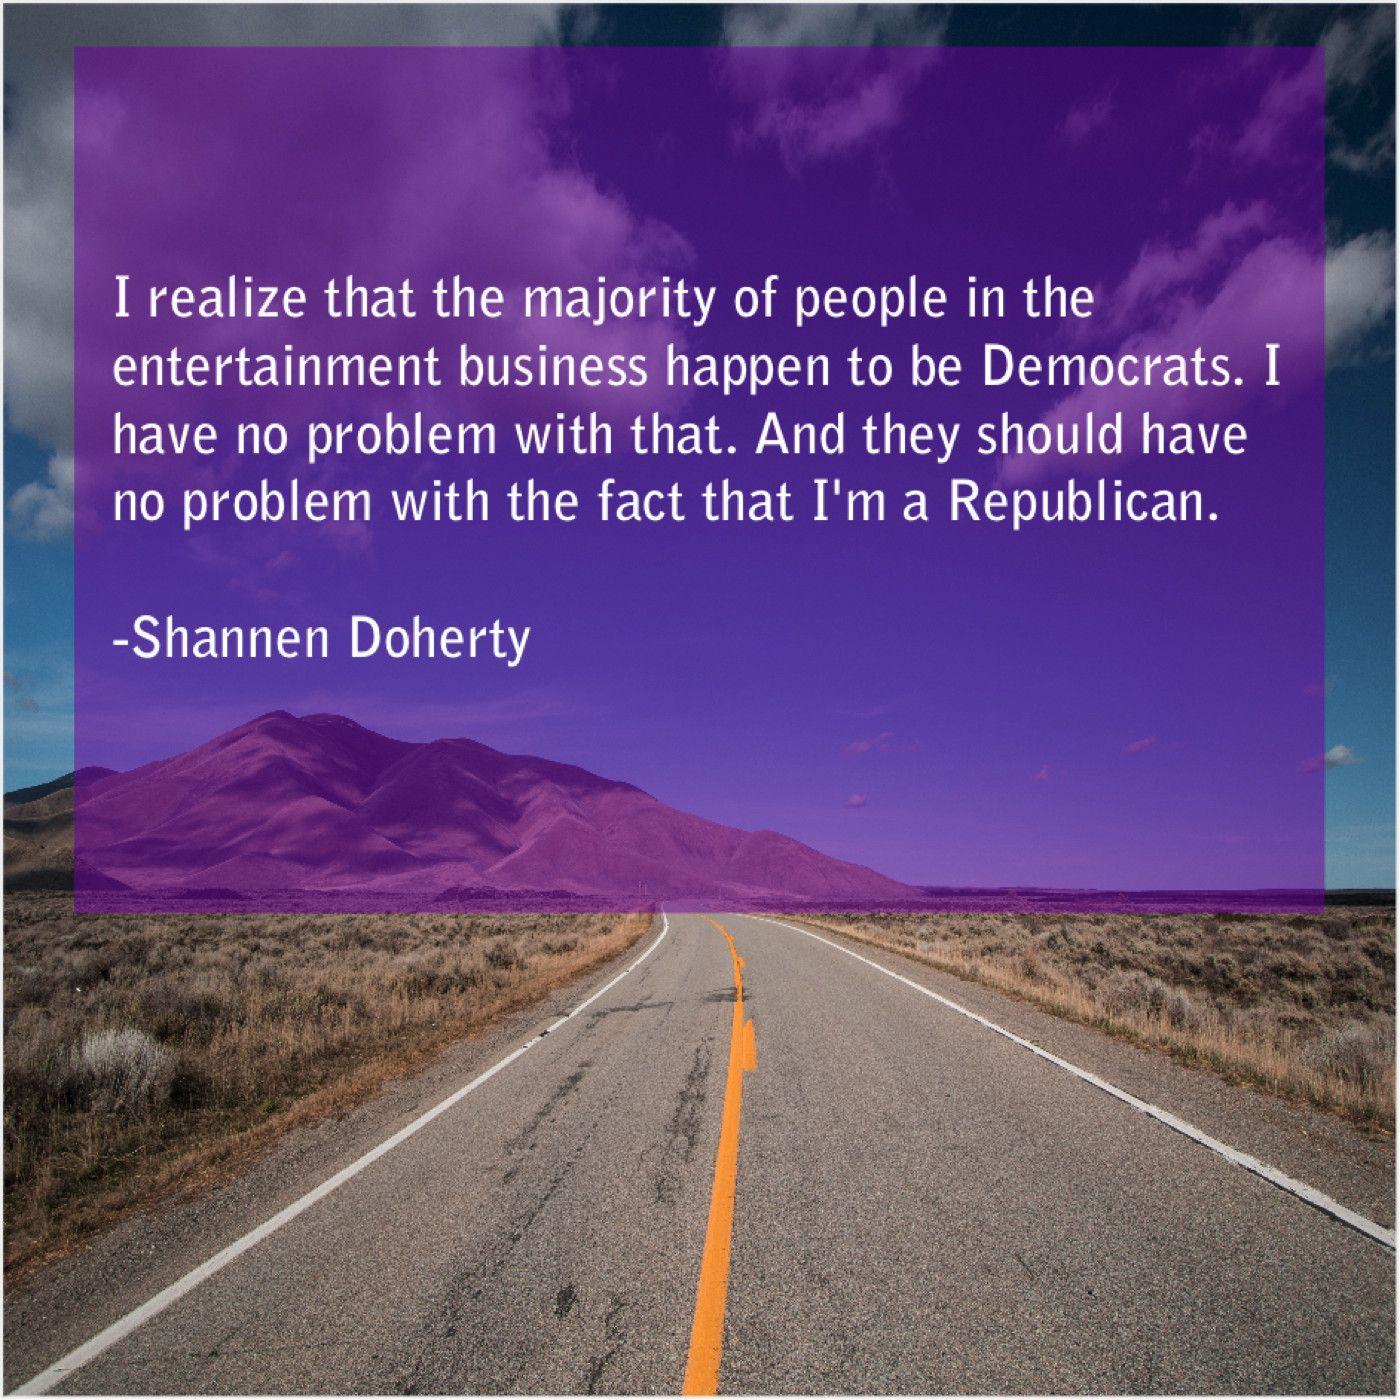 Shannen Doherty I Realize That The Majority Thomas Merton Merton Shannen Doherty